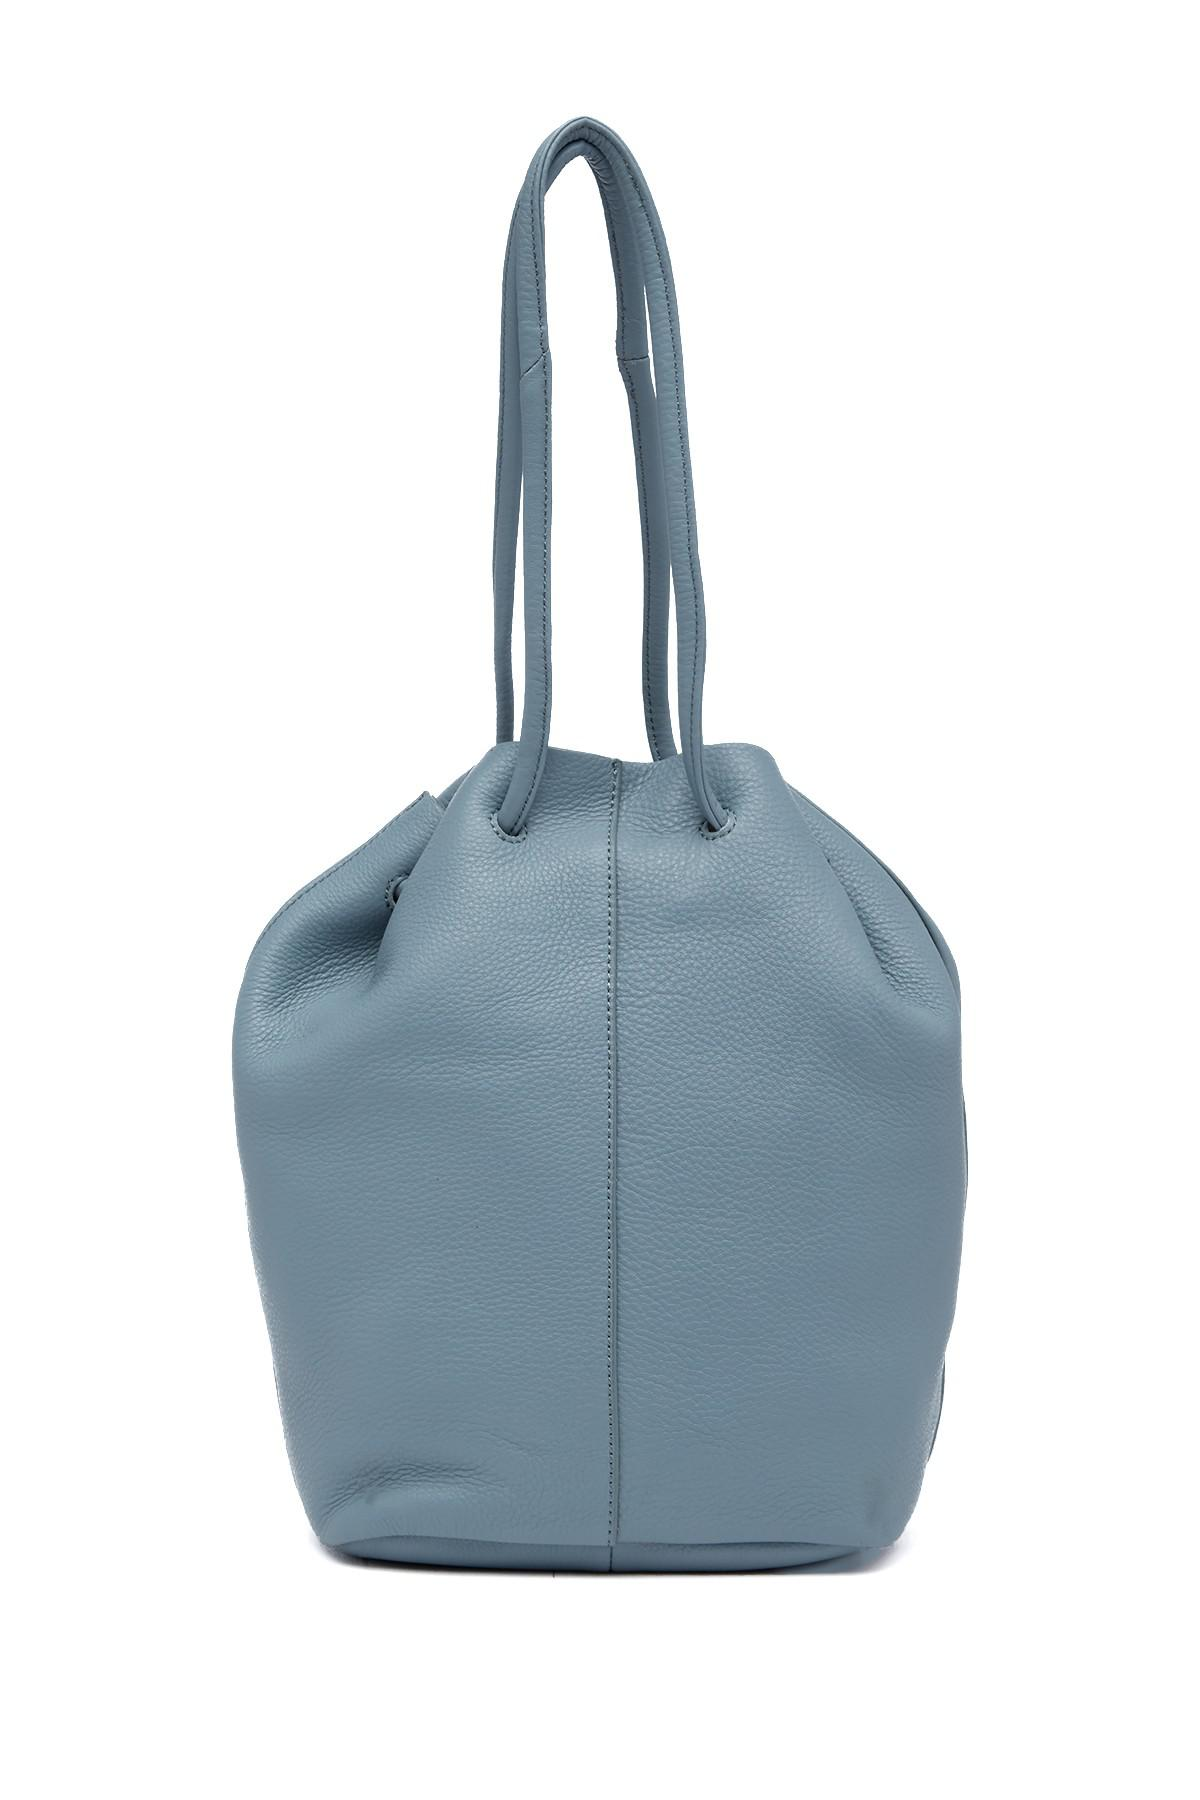 Lyst Christopher Kon Pebbled Leather Drawstring Bucket Bag In Blue Shark Gallery